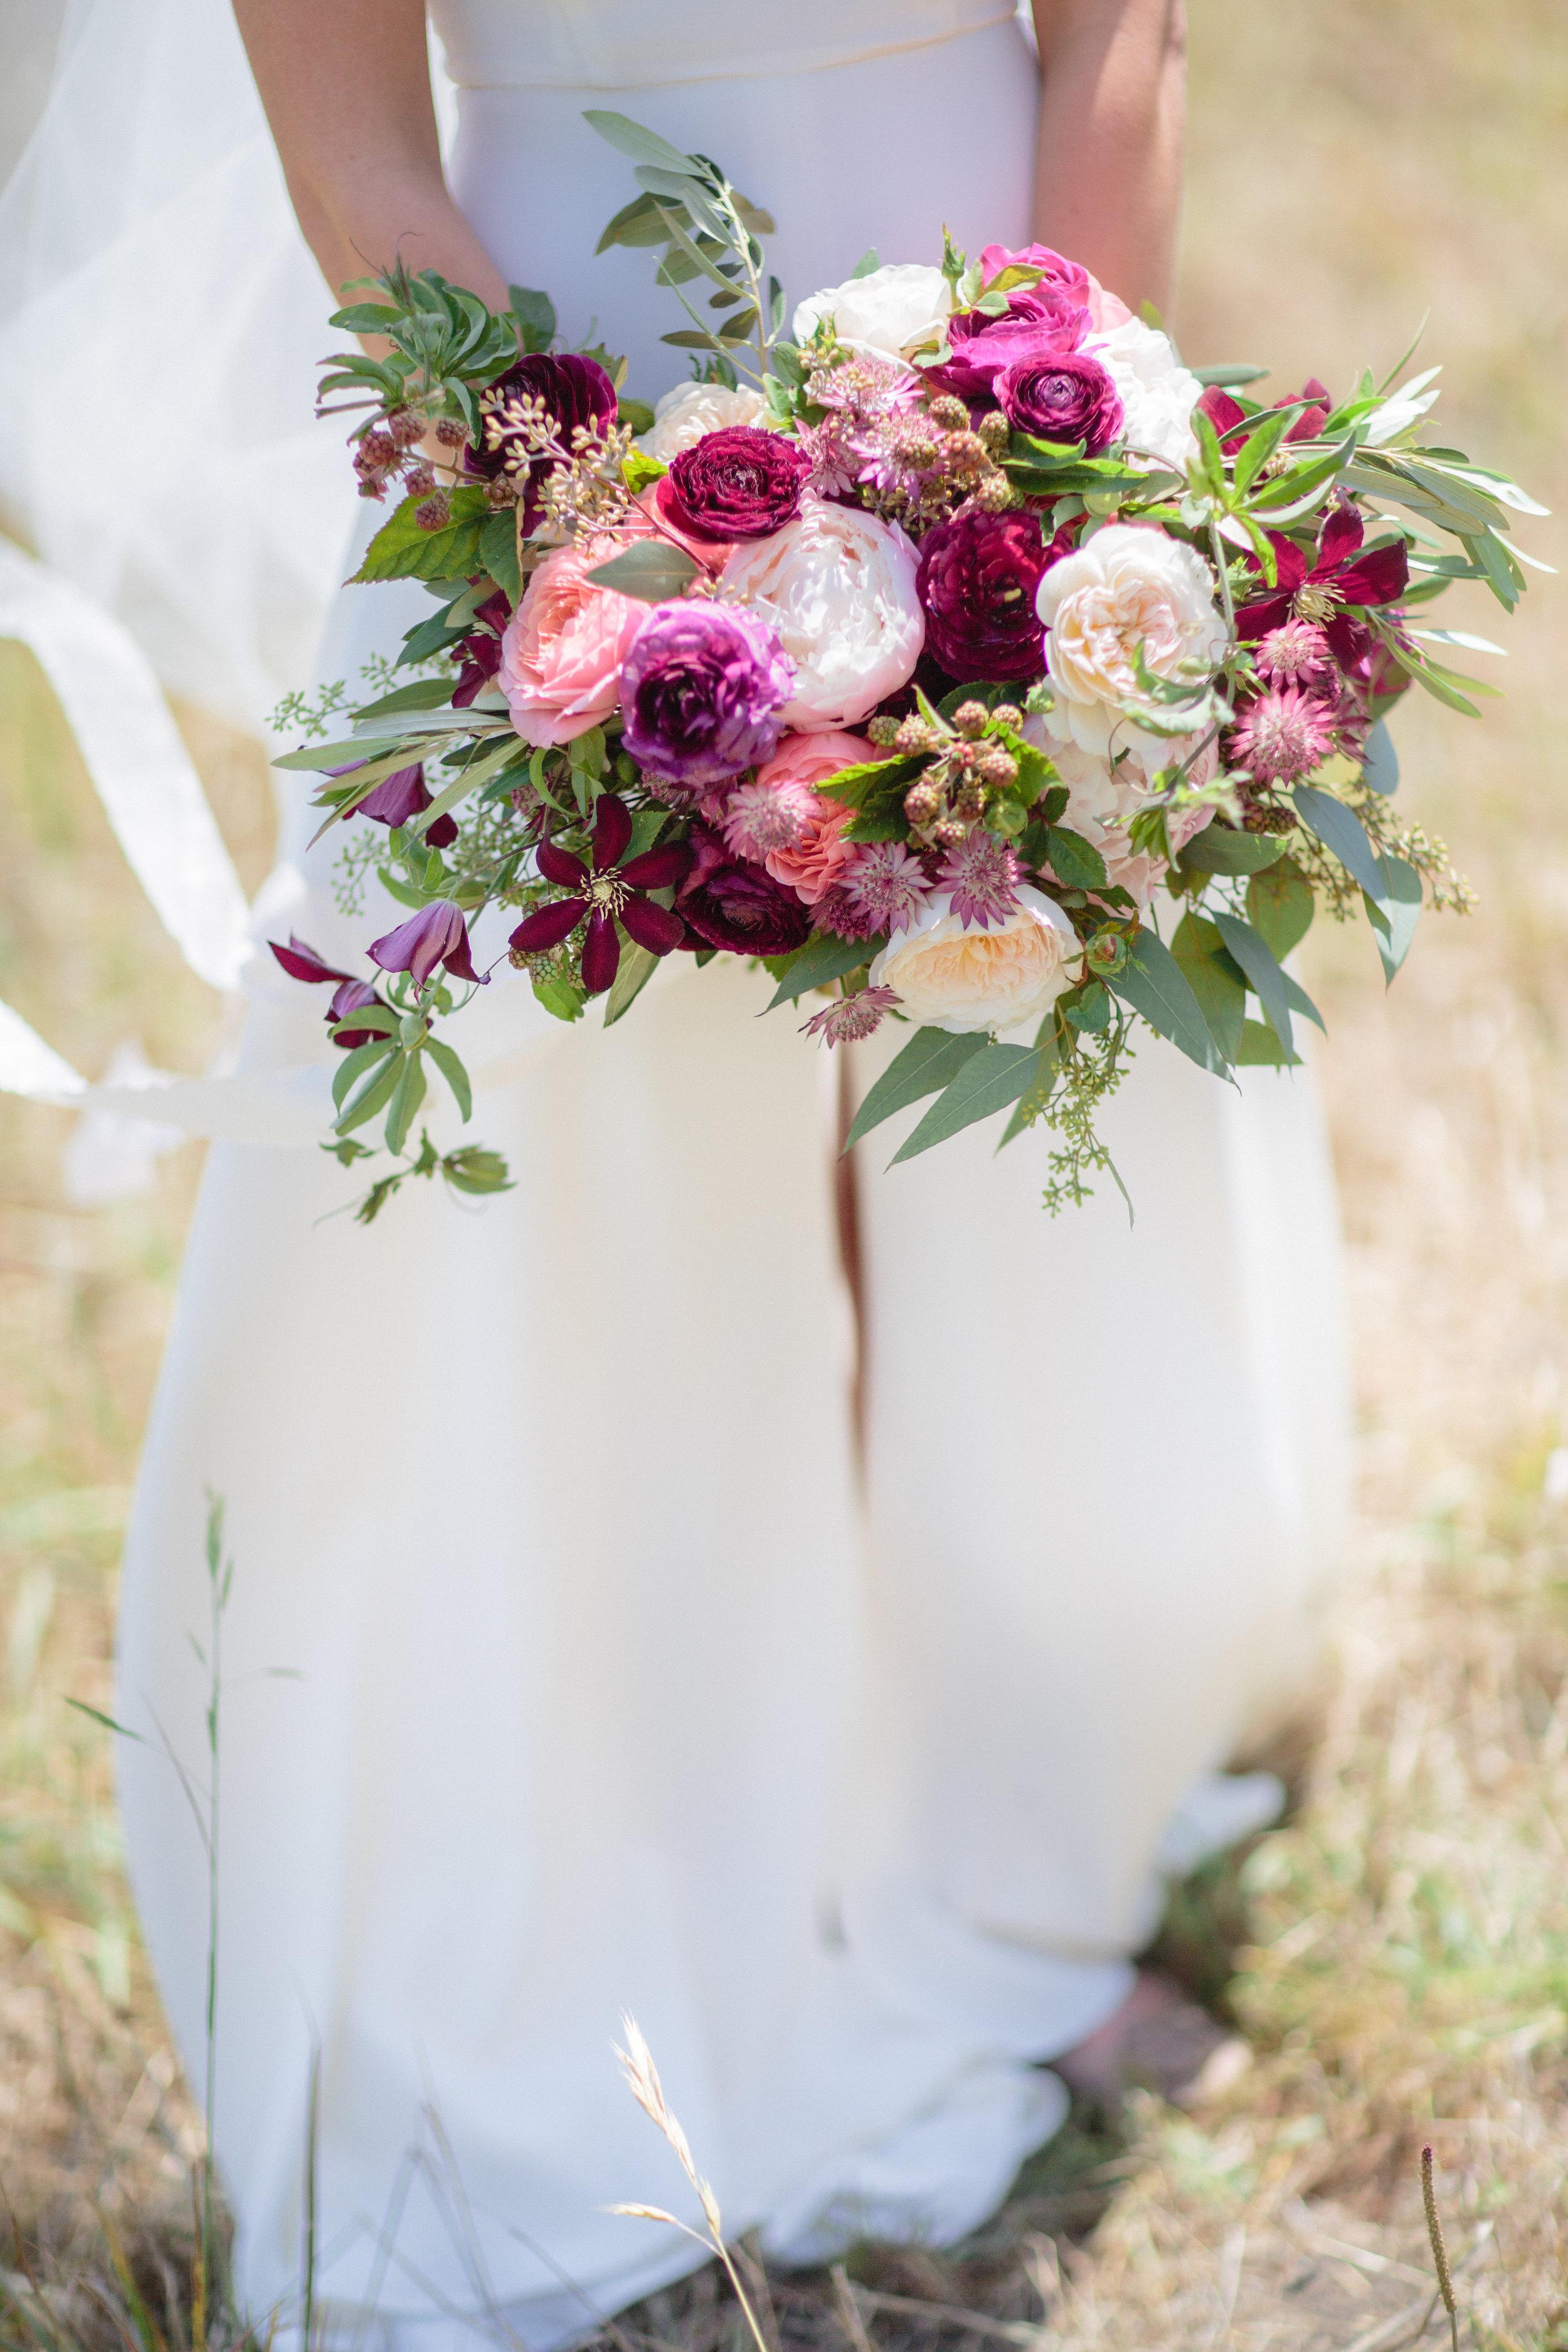 larissa-cleveland-sivanjeremy-wedding-0211-2.jpg